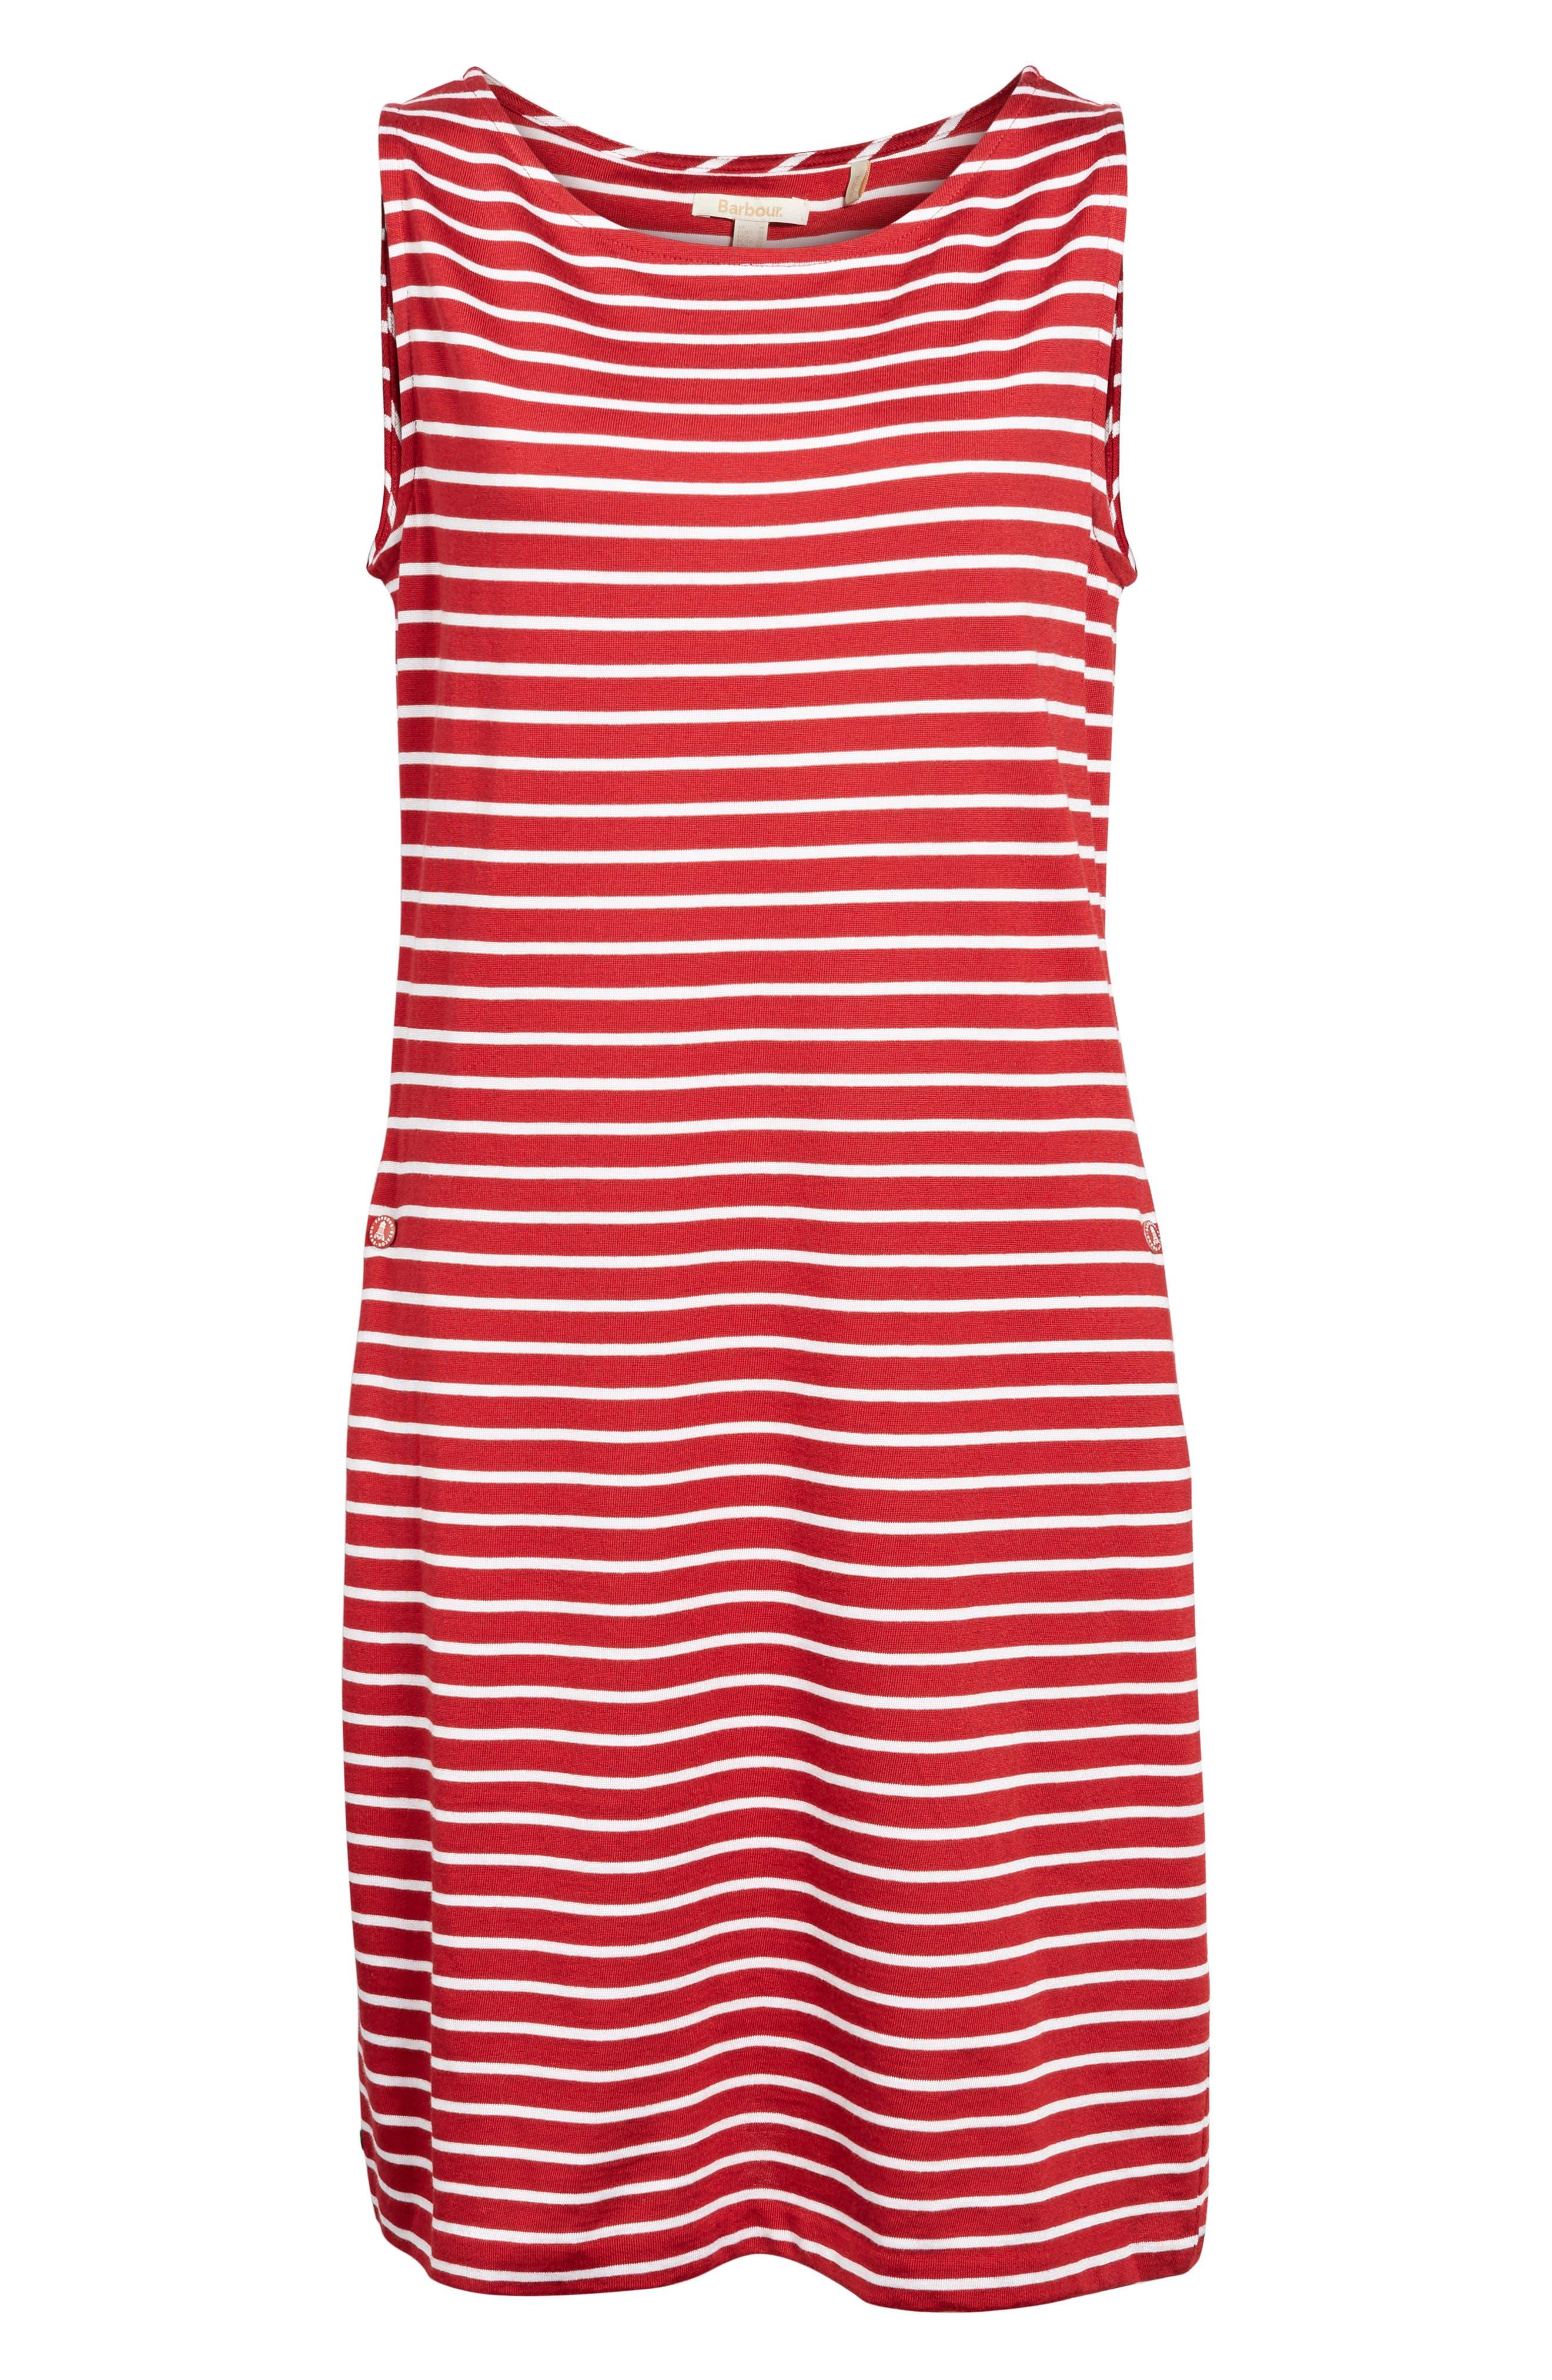 Dalmore Stripe Jersey Sleeveless Shift Dress,                             Alternate thumbnail 6, color,                             630